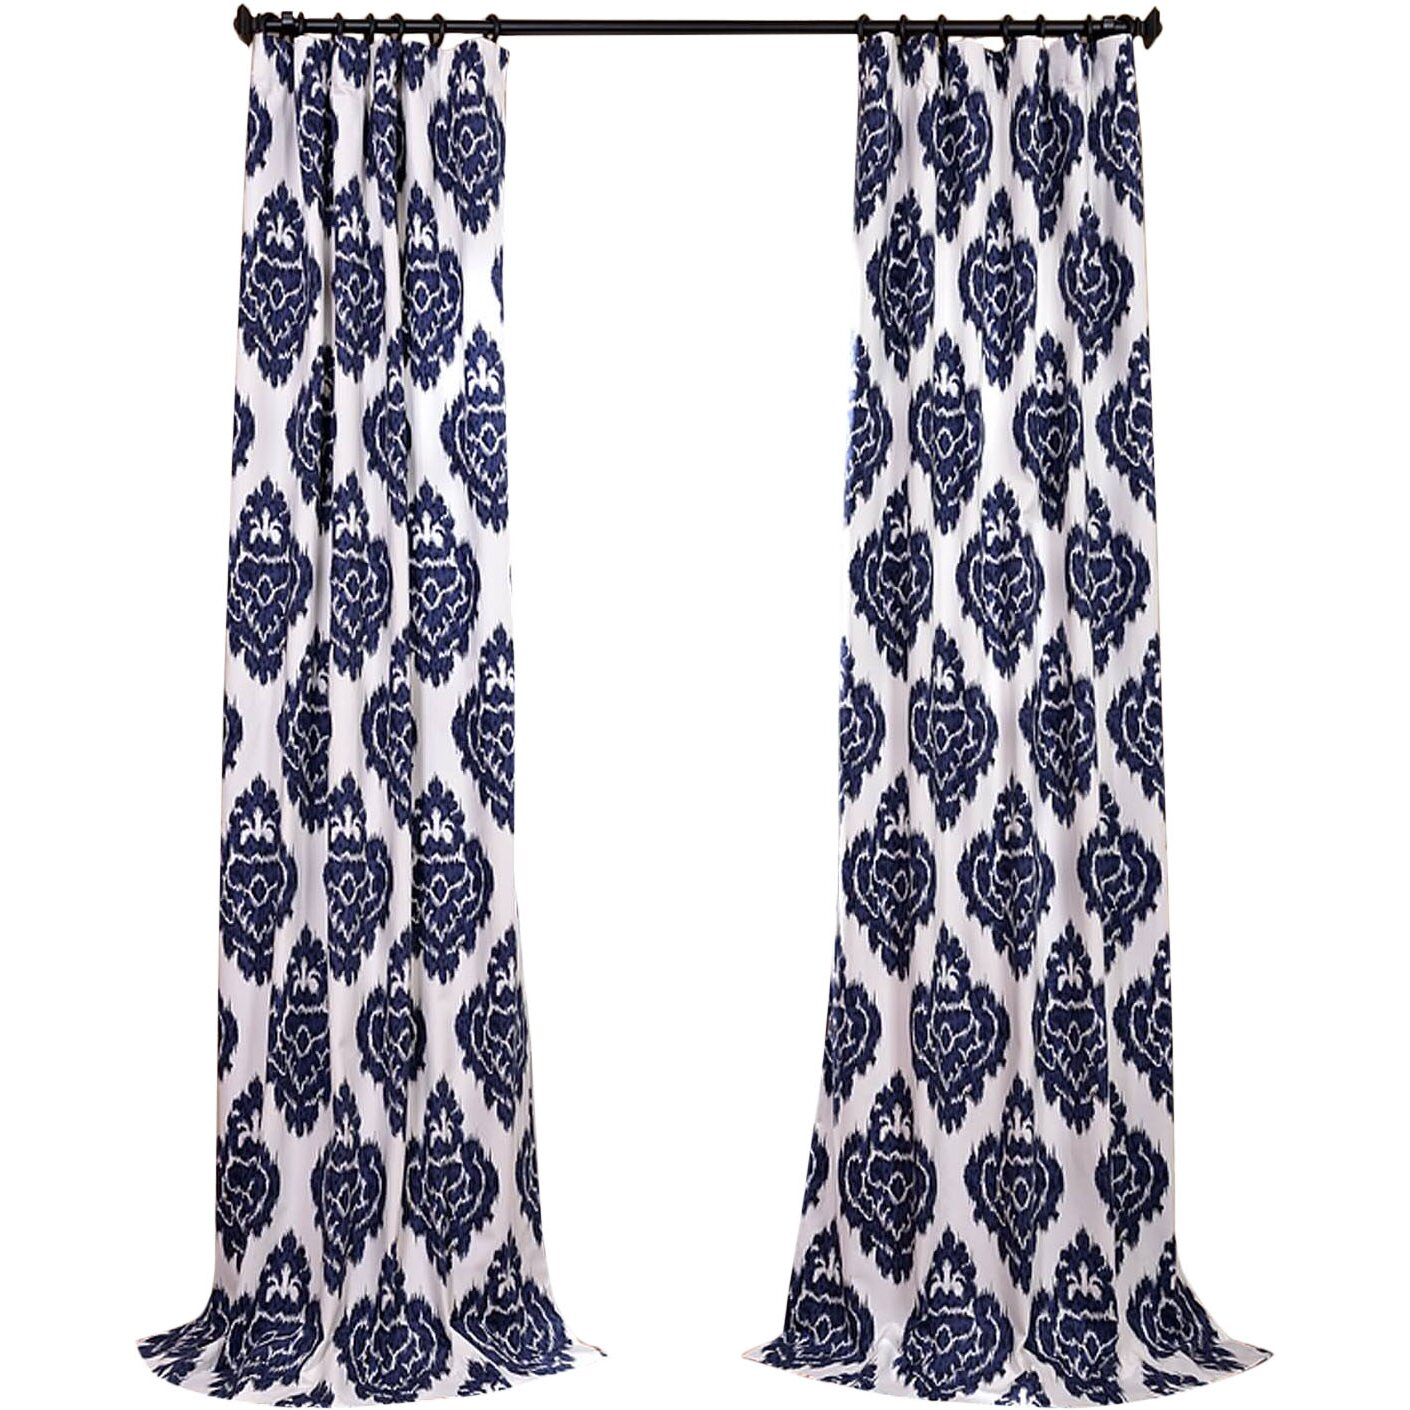 Ikat curtain panels - Half Price Drapes Ikat Printed Cotton Semi Opaque Single Curtain Panel